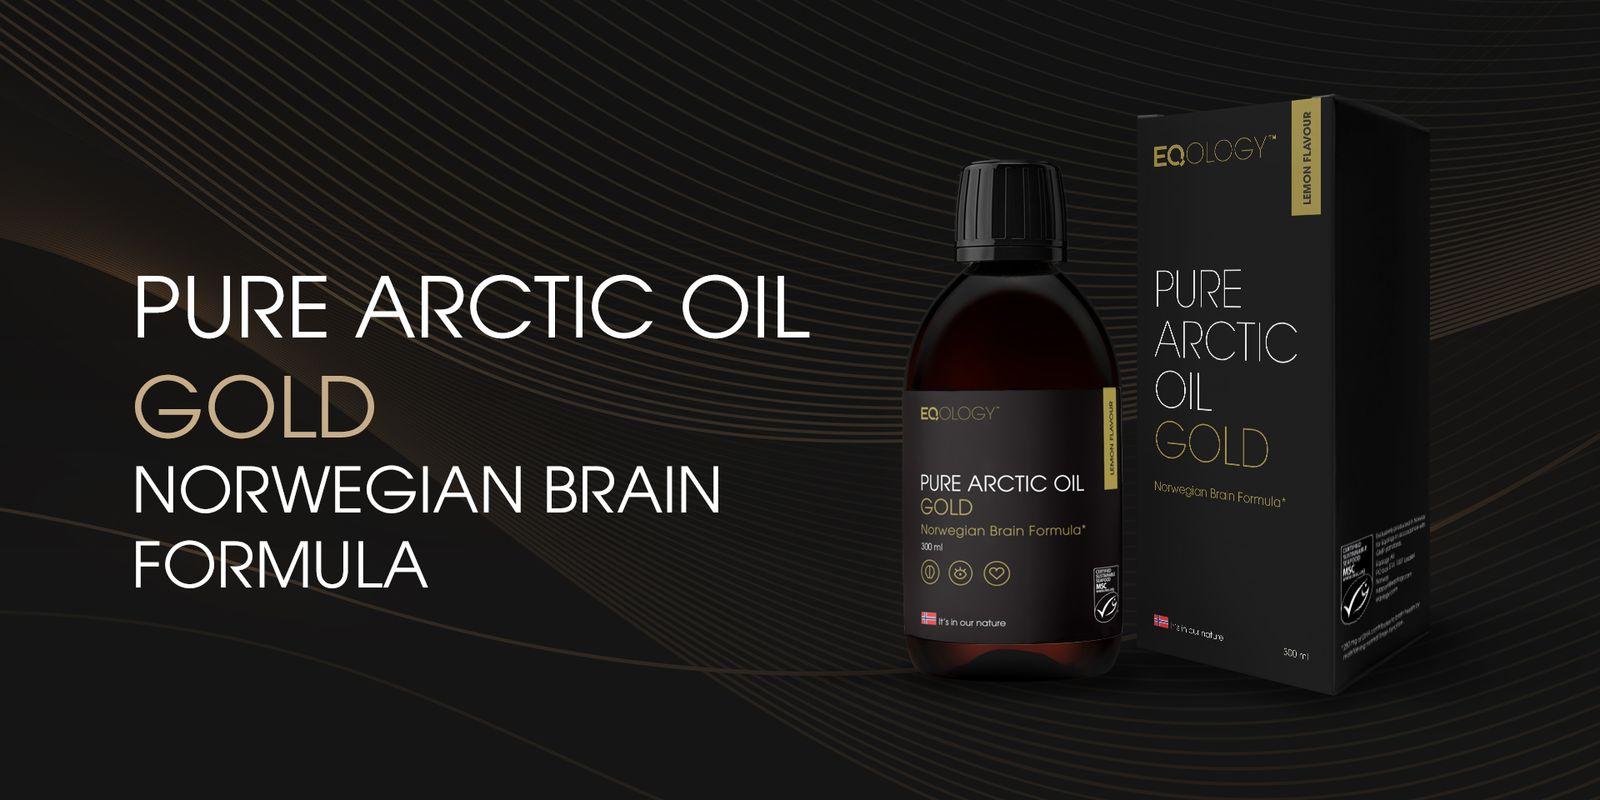 Pure Arctic Oil Gold